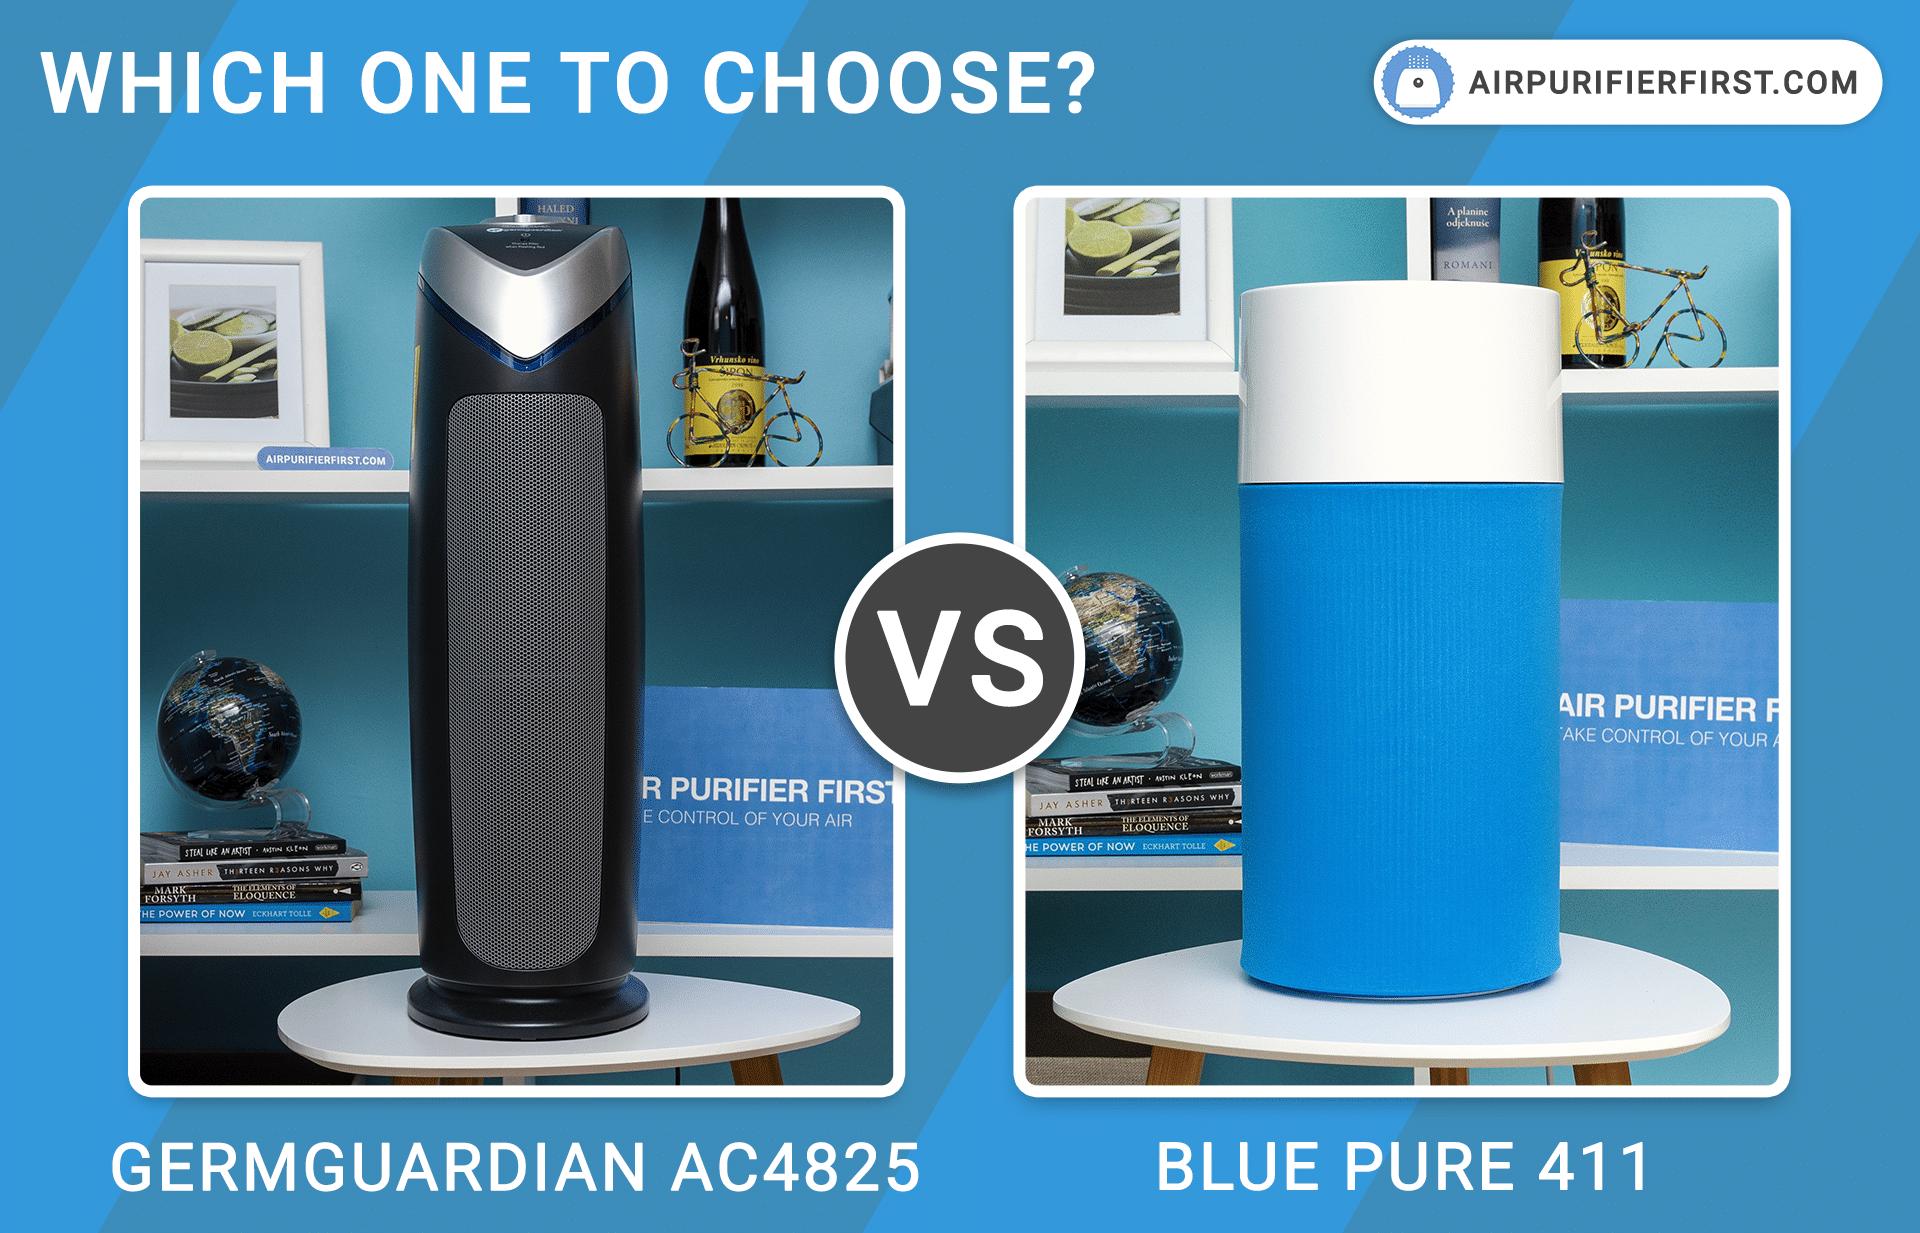 GermGuardian AC4825 Vs Blueair Blue Pure 411 - Comparison